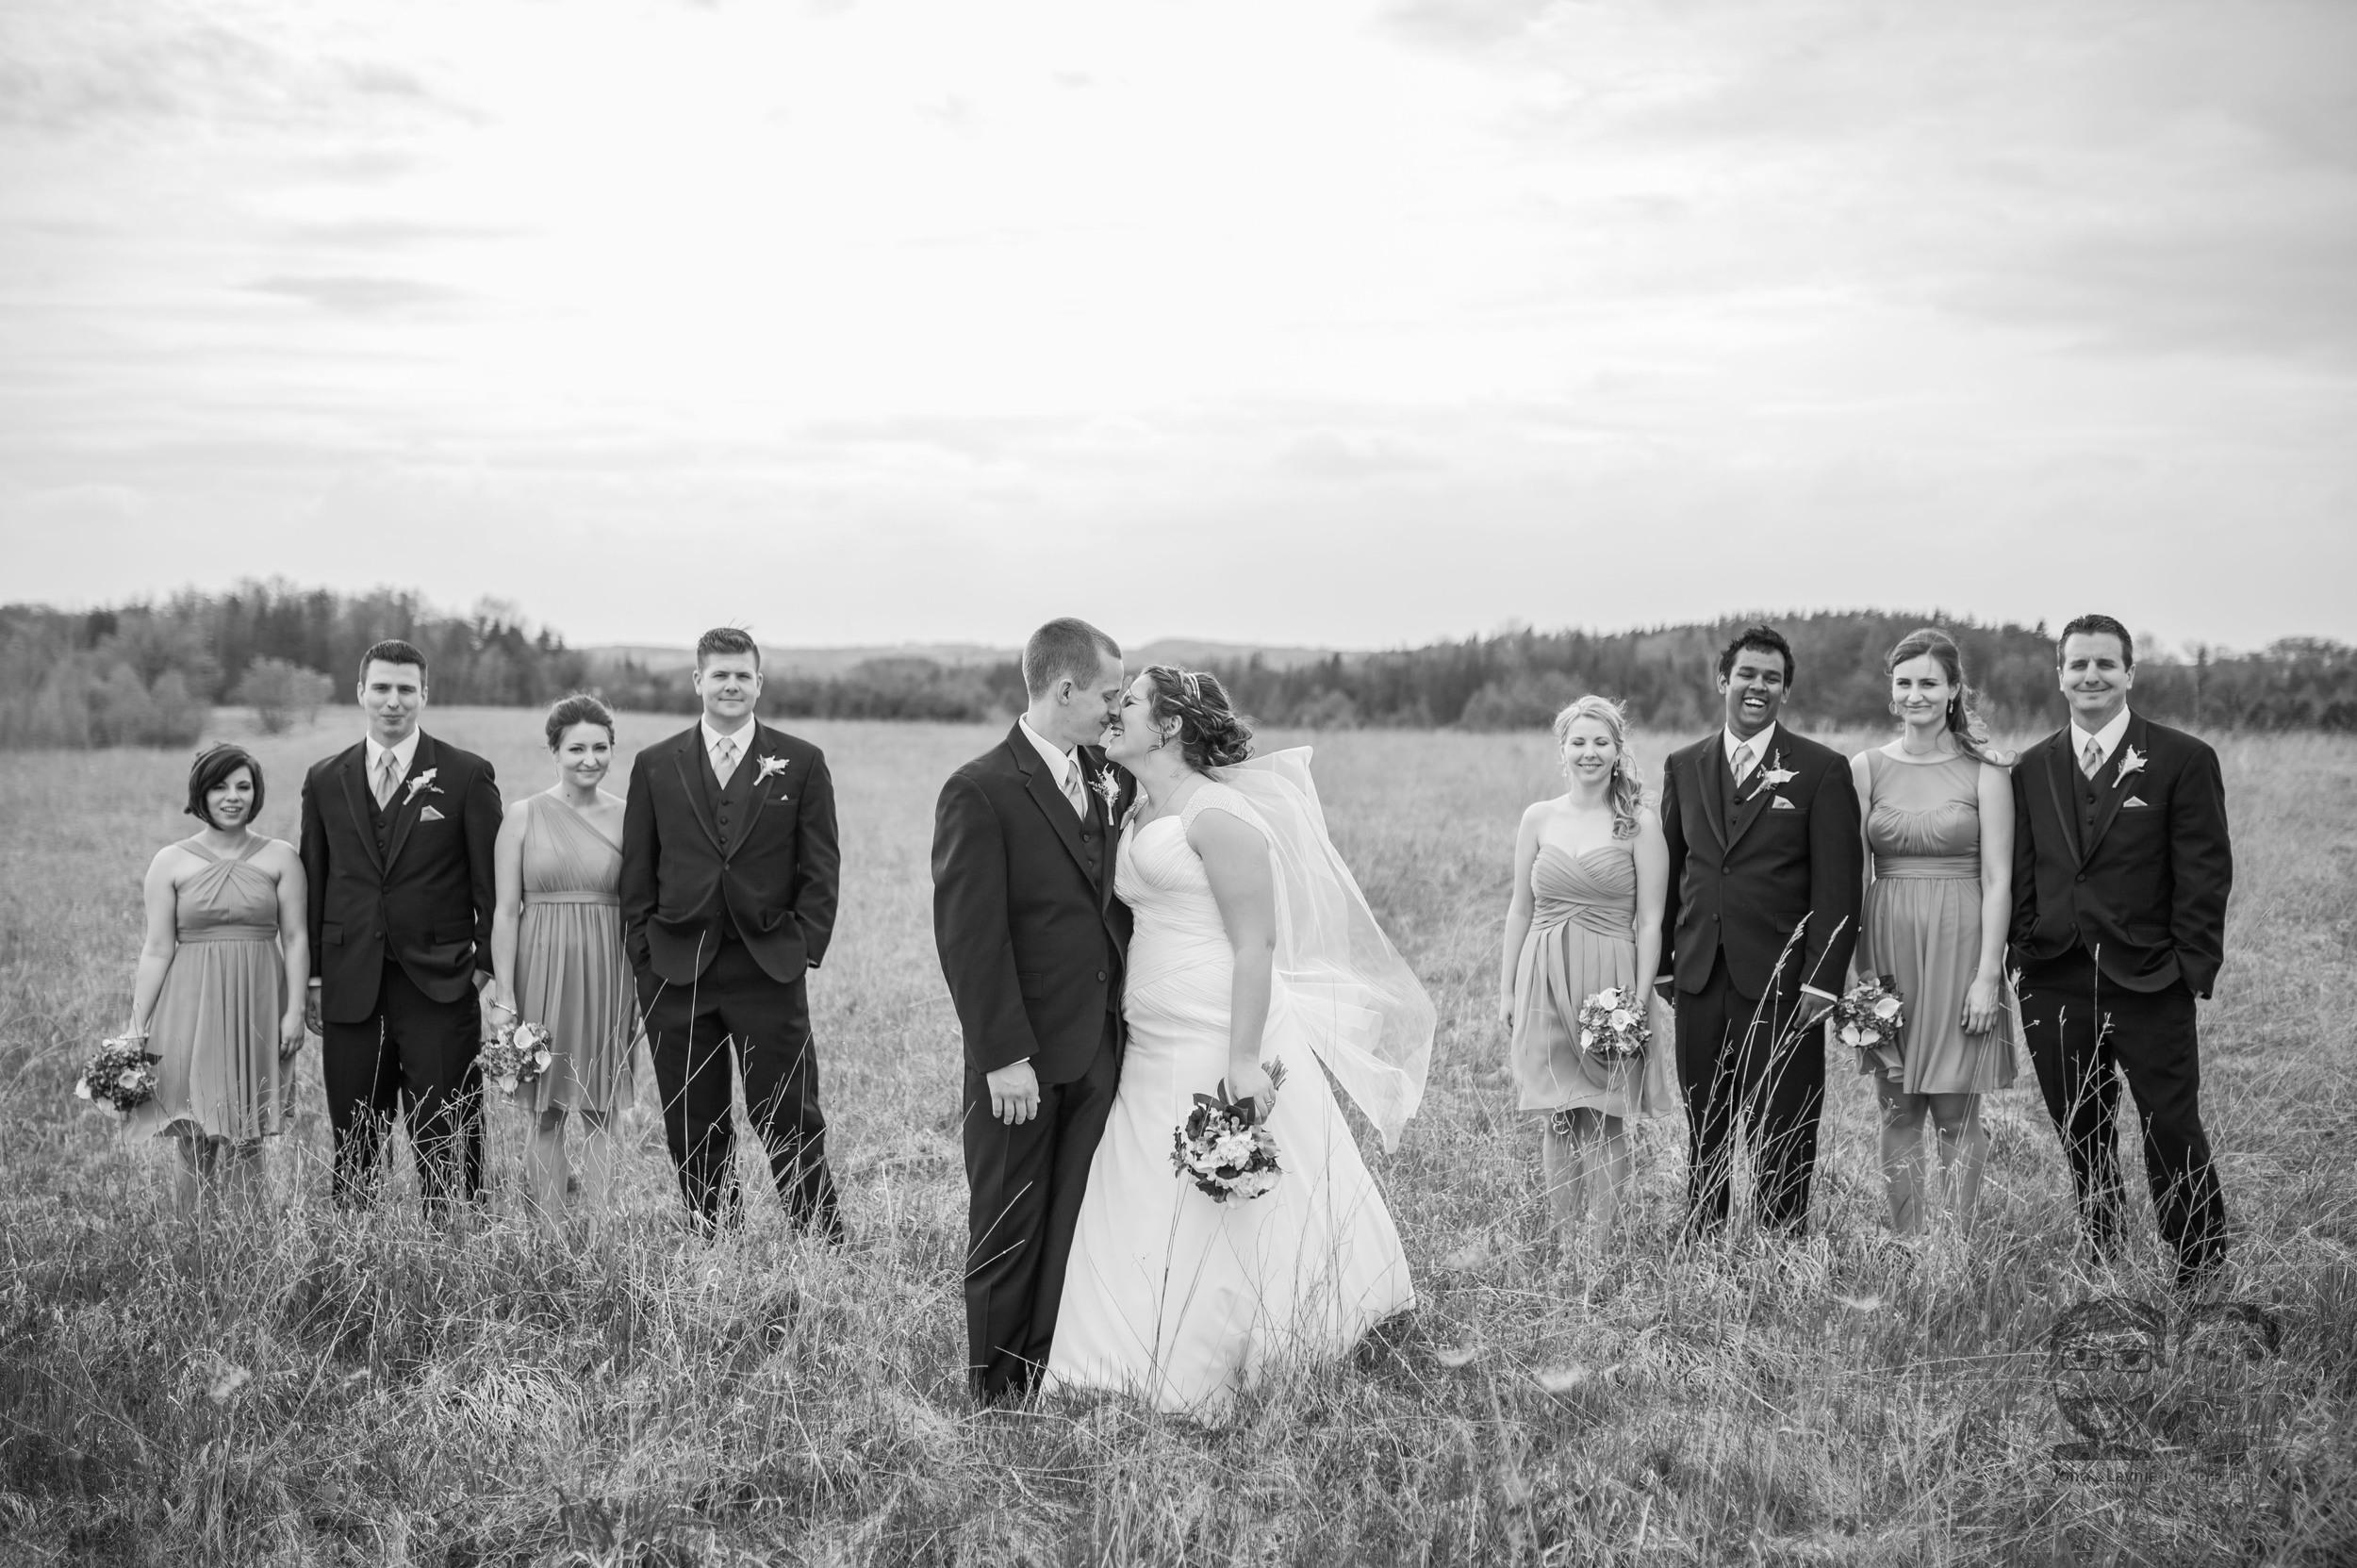 26Toronto Wedding Photographers and Videographers-Jono & Laynie Co.-Orangeville Wedding.jpg